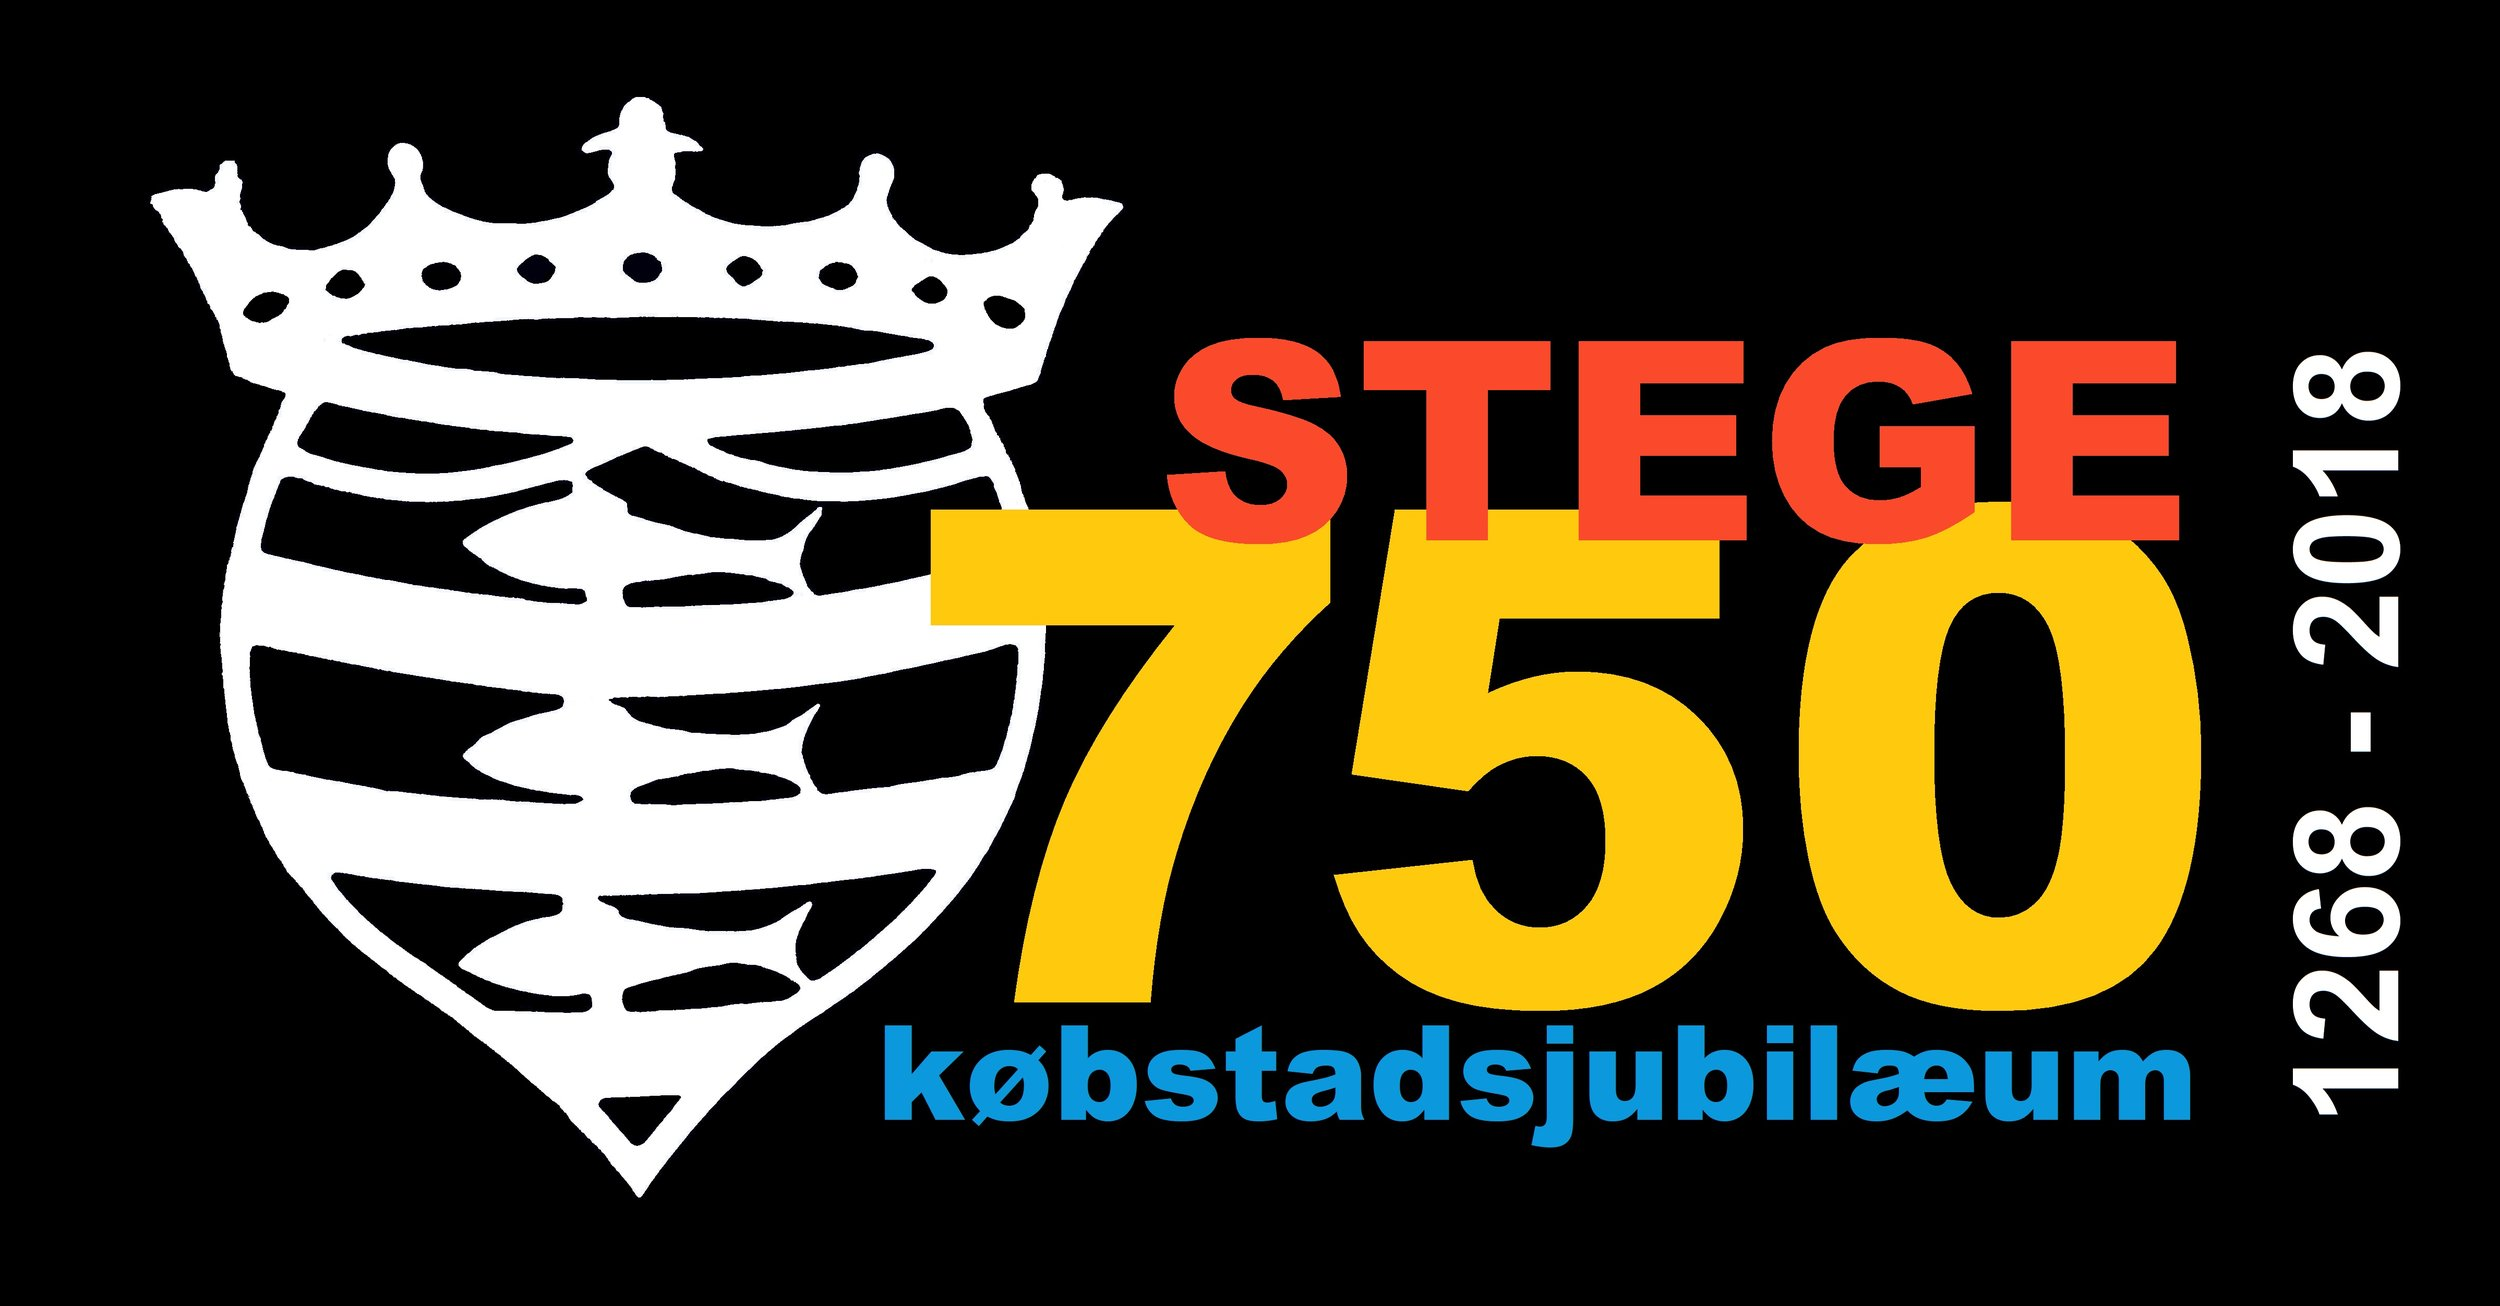 logo byjubilæum.jpg